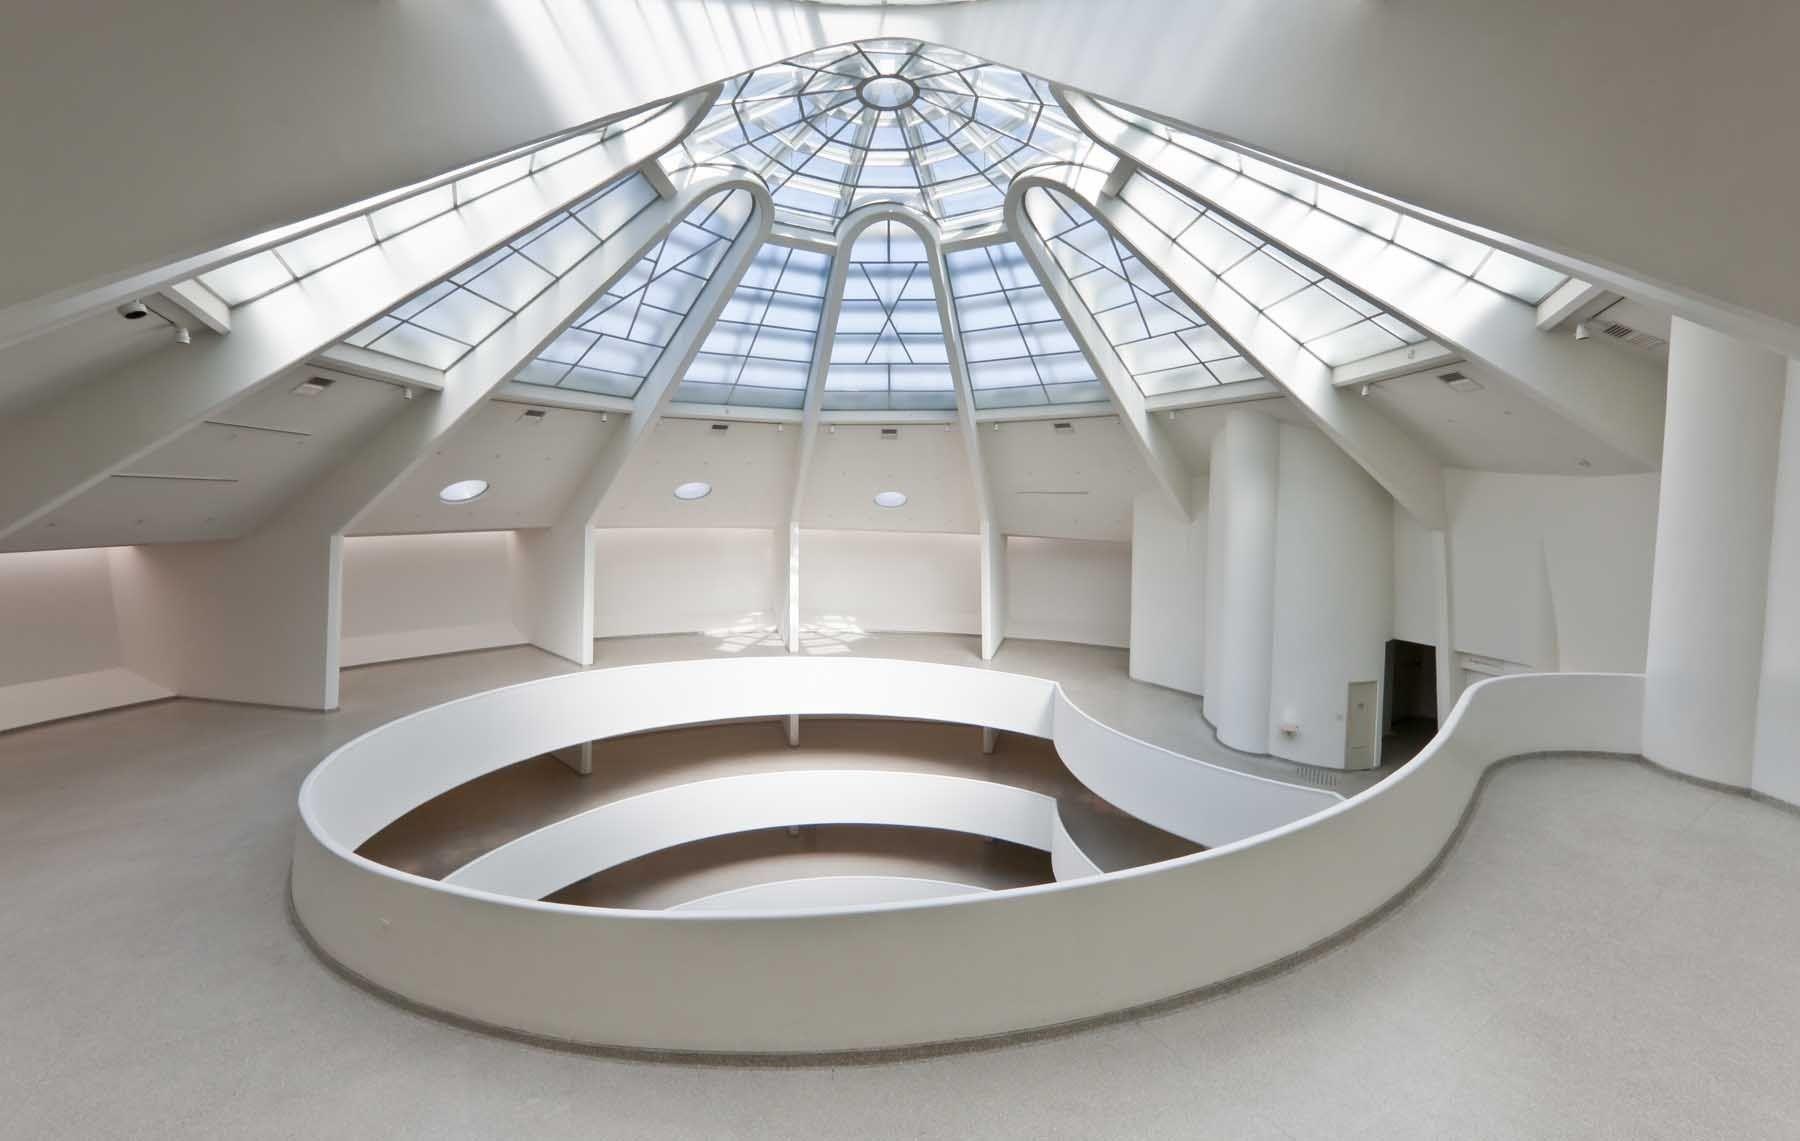 Bien-aimé guggenheim museum nyc | Guggenheim Museum, New York | Guggenheim  GE05